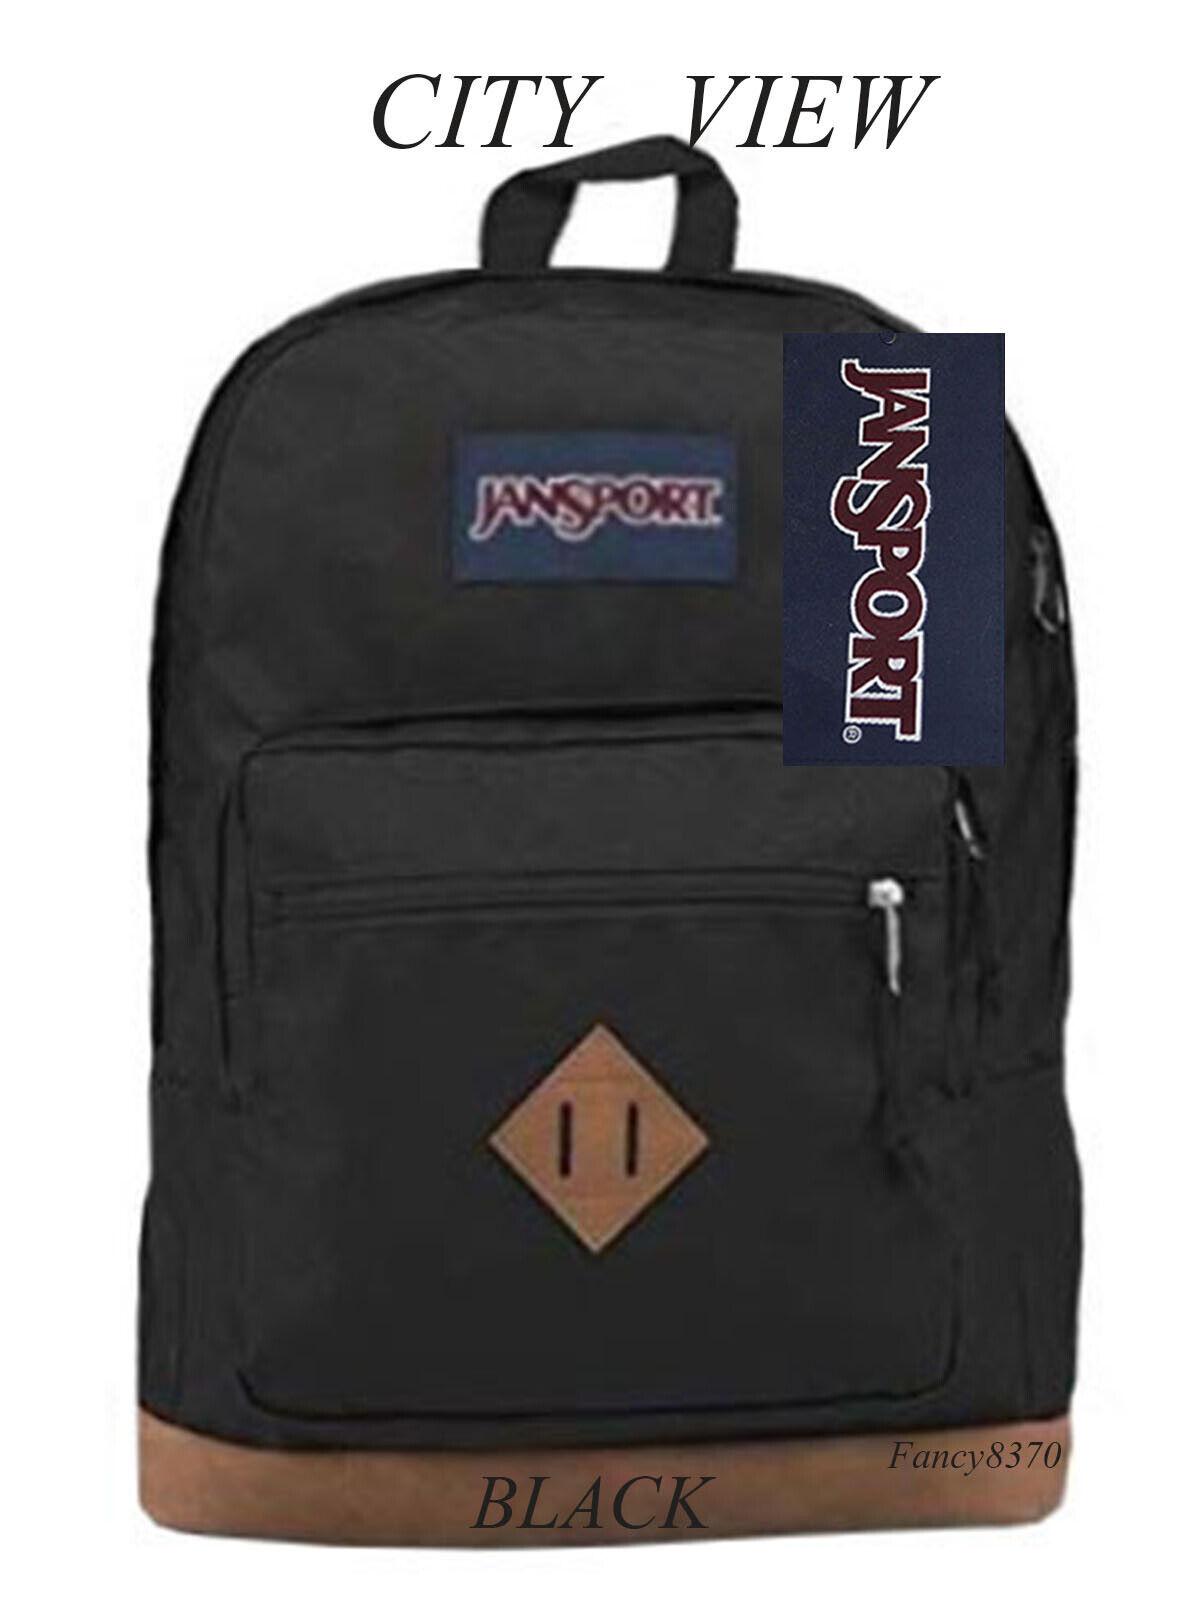 Aztec New JanSport City View Laptop Backpack